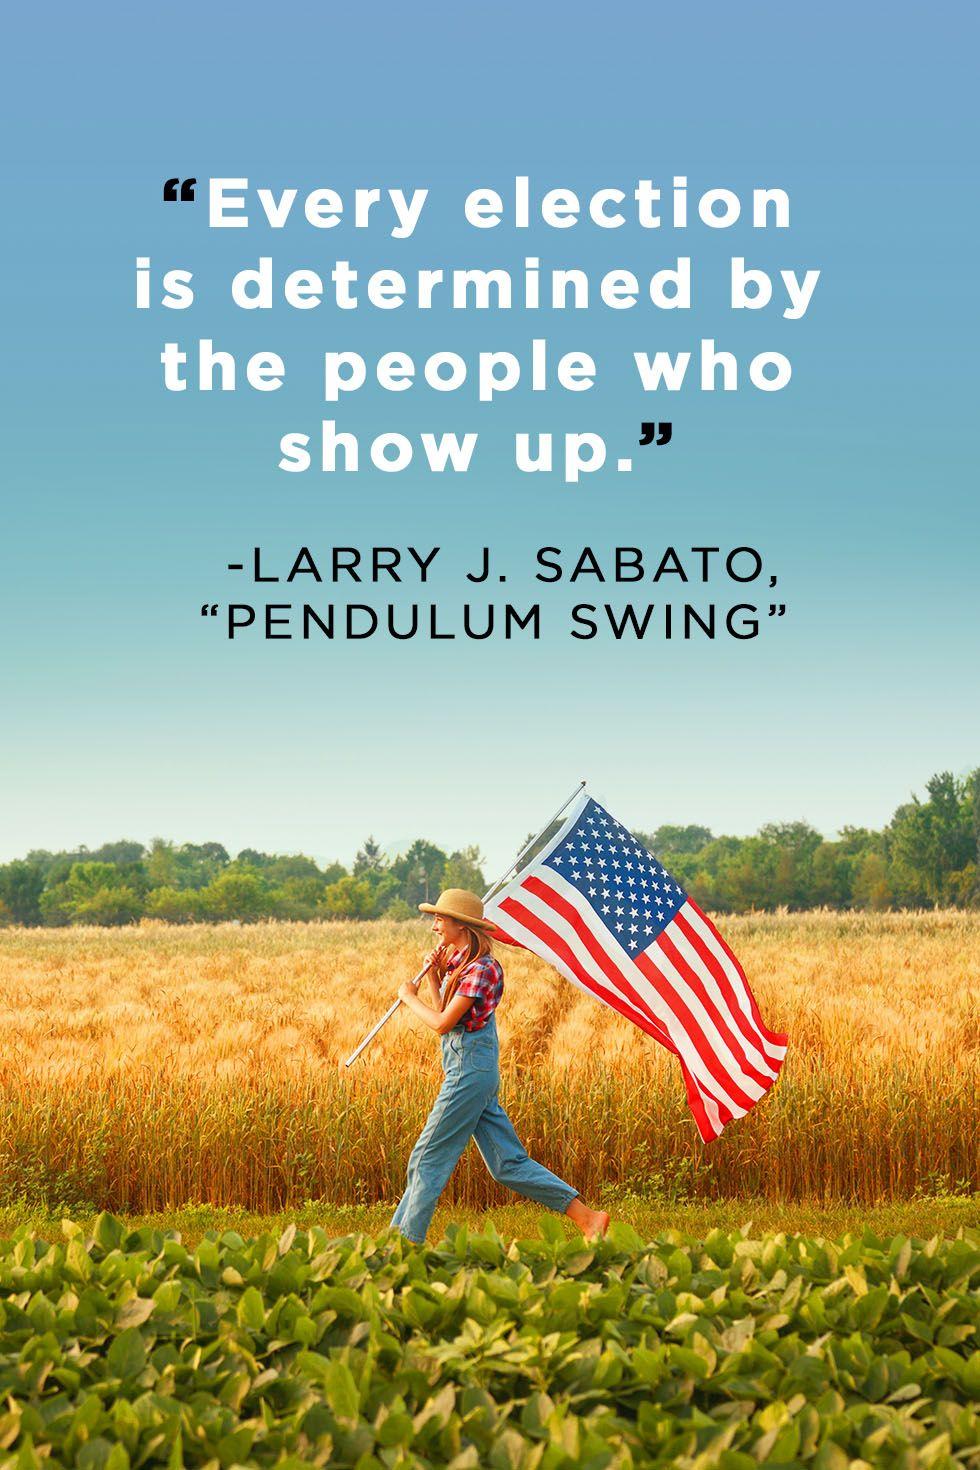 voting quotes larry j. sabato